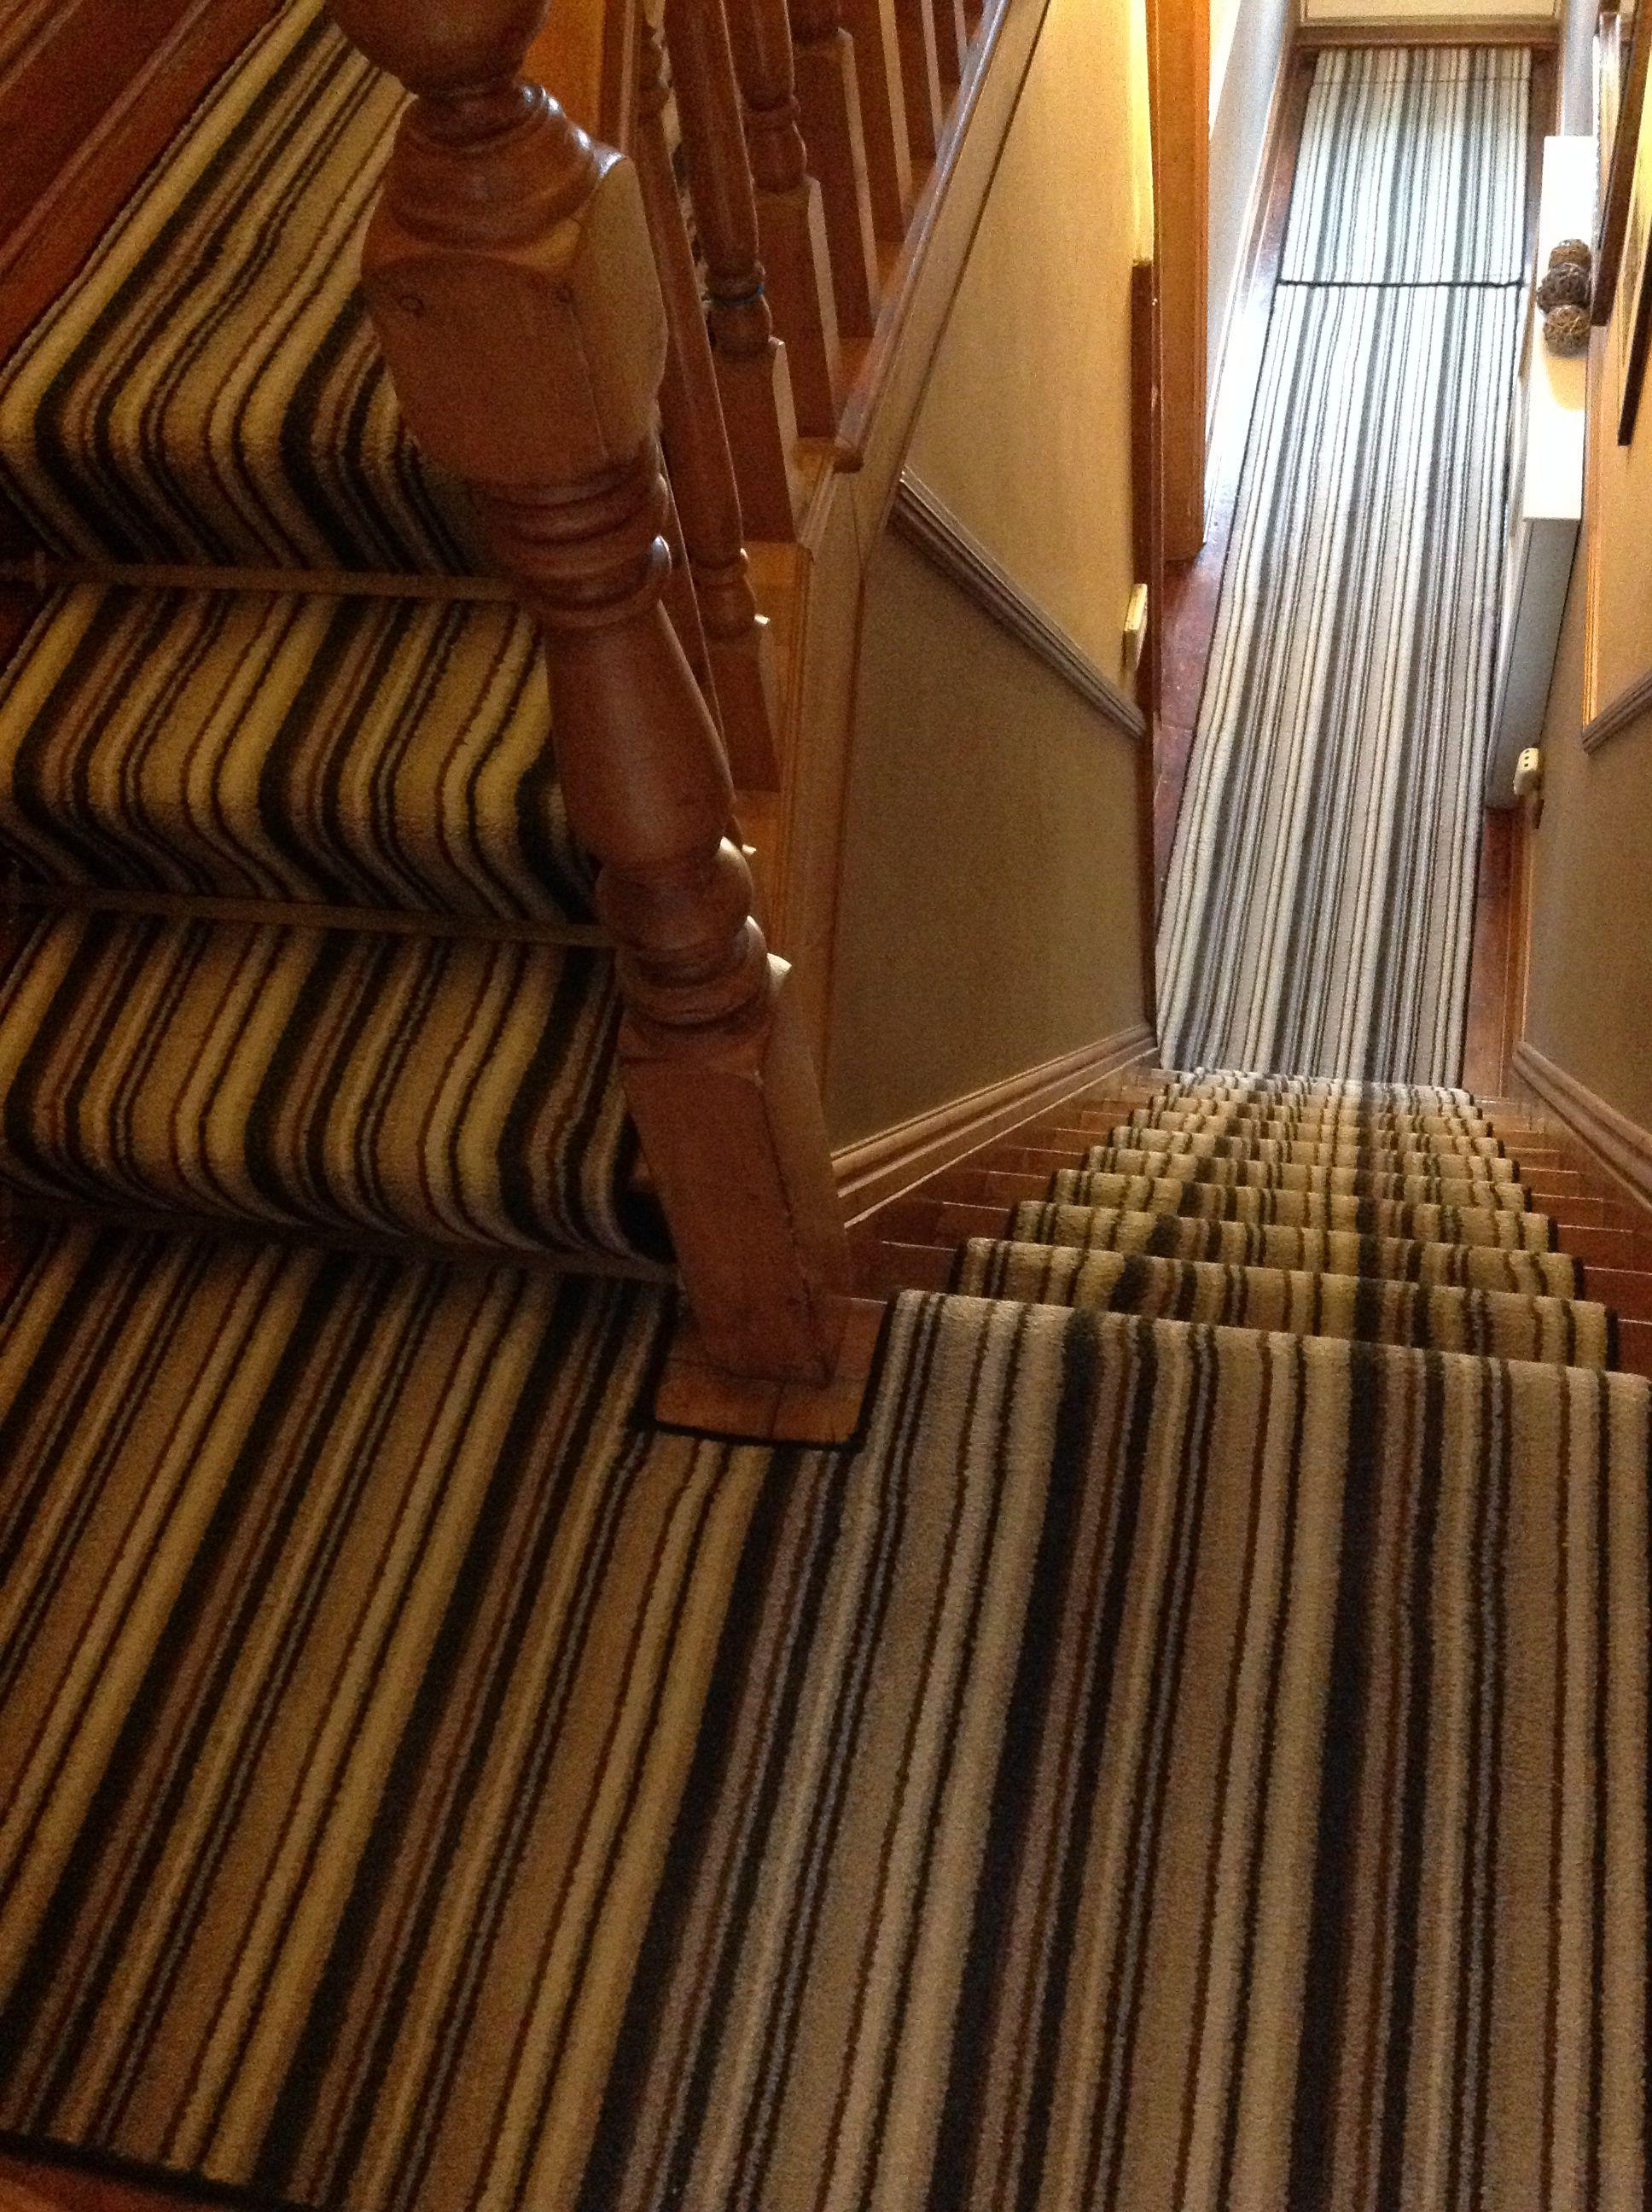 Stripes Stair Carpet Victorian Terrace House Homes